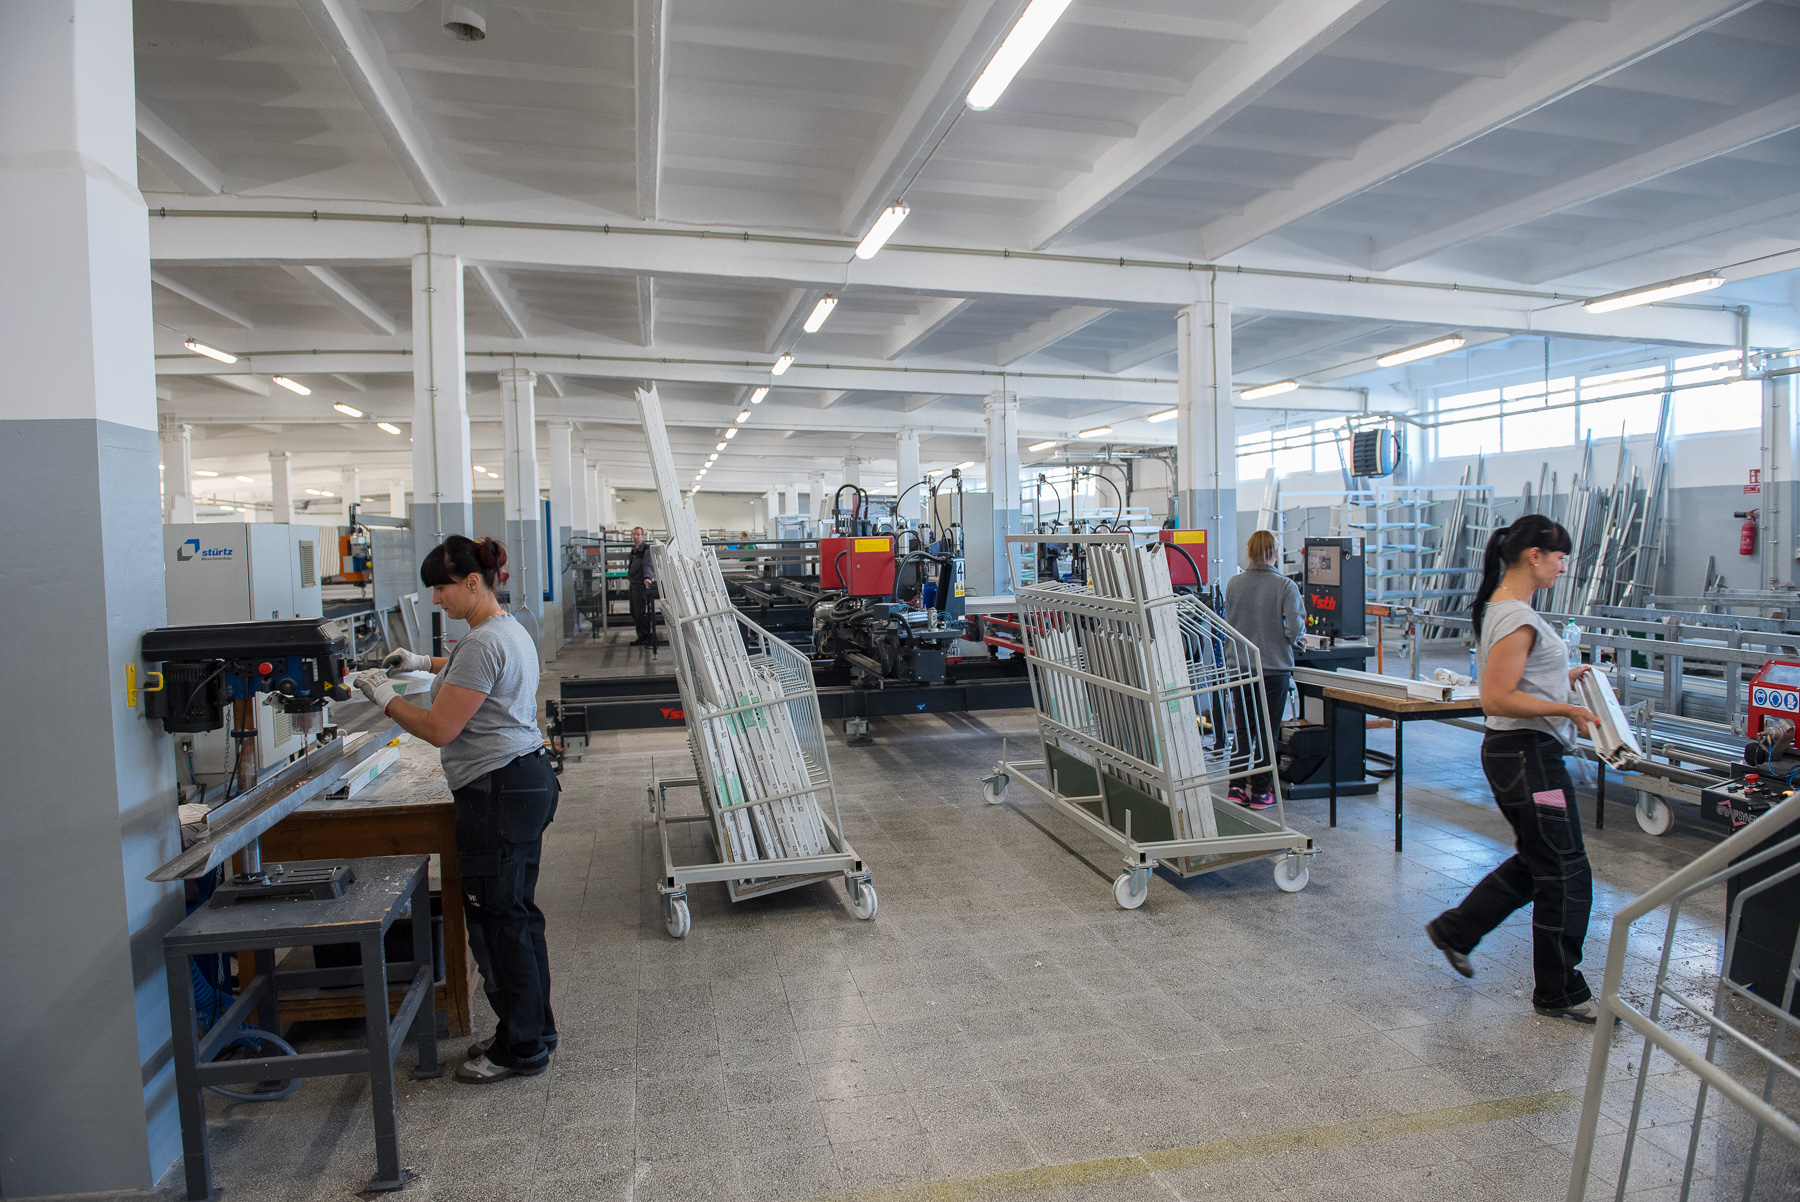 Fabryka połczyńska (10)